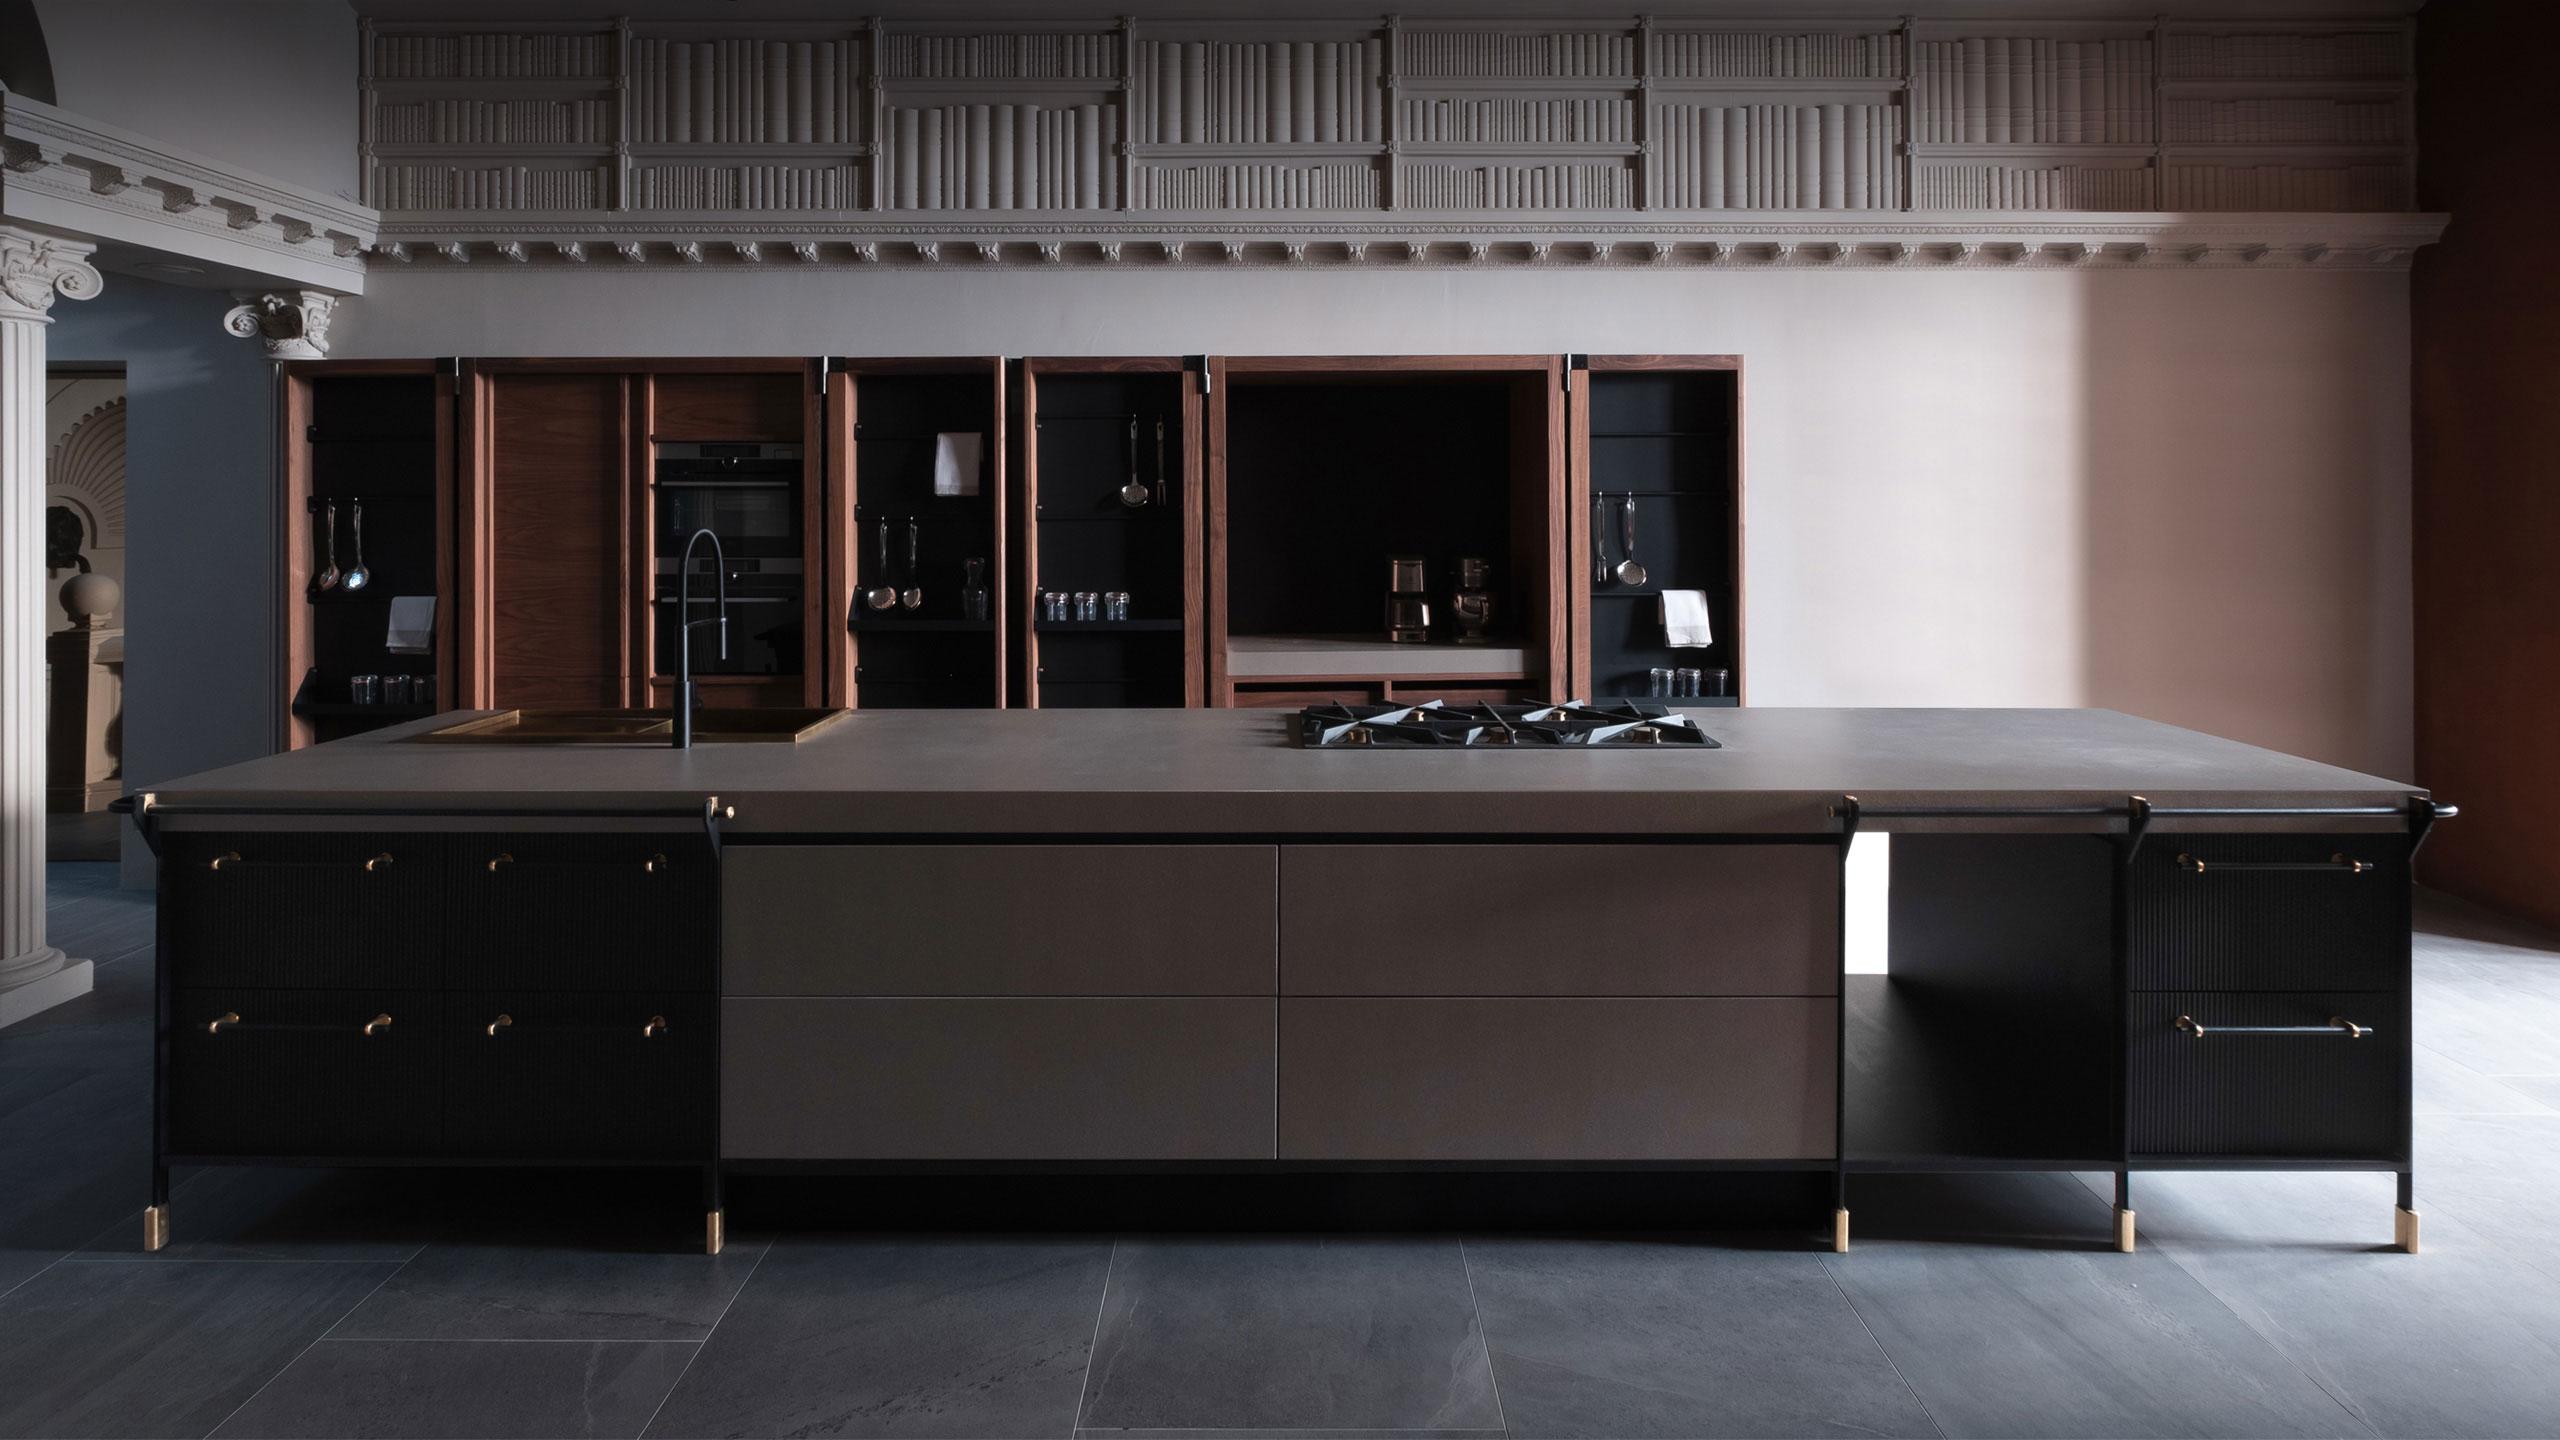 Canossa per home - SCIC Italia - SCIC Cucine